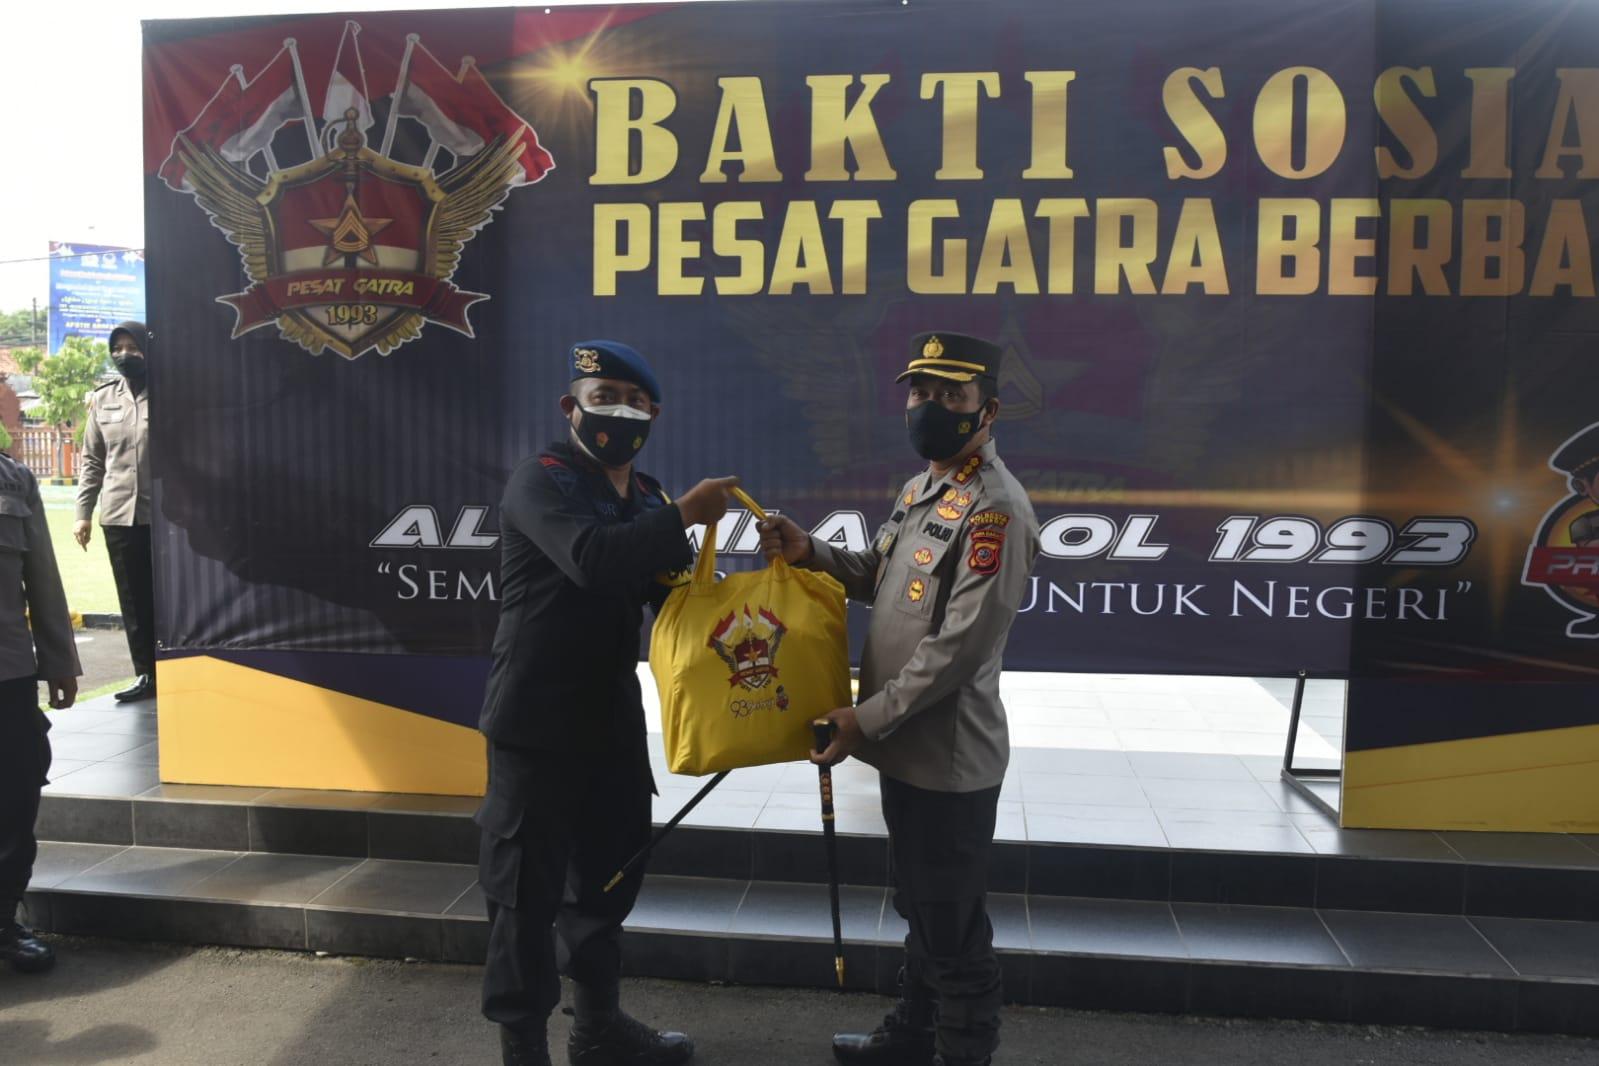 Polresta Cirebon dan Batalyon C Pelopor Satbrimob Polda Jabar Distribusikan Bansos dari Alumni Akpol 1993